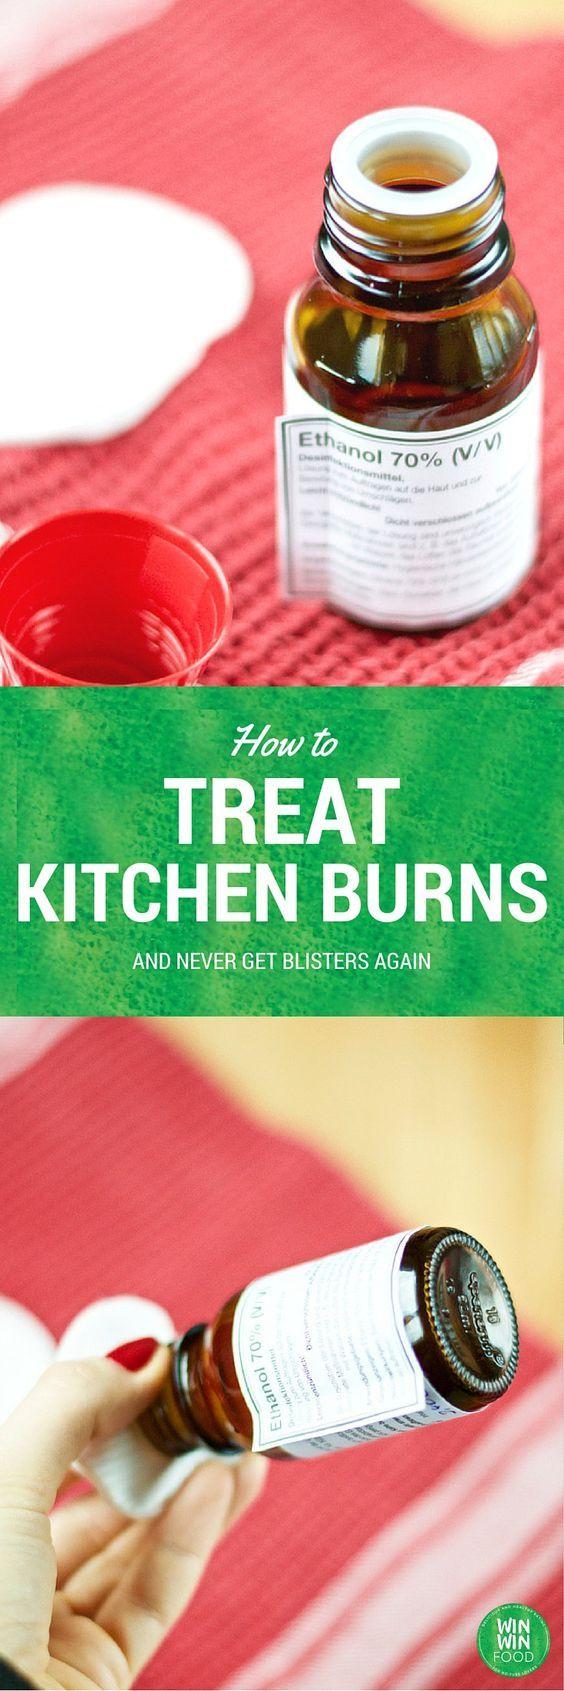 How to Treat Kitchen Burns | WIN-WINFOOD.com No more blisters!!! :) #kitchenhack